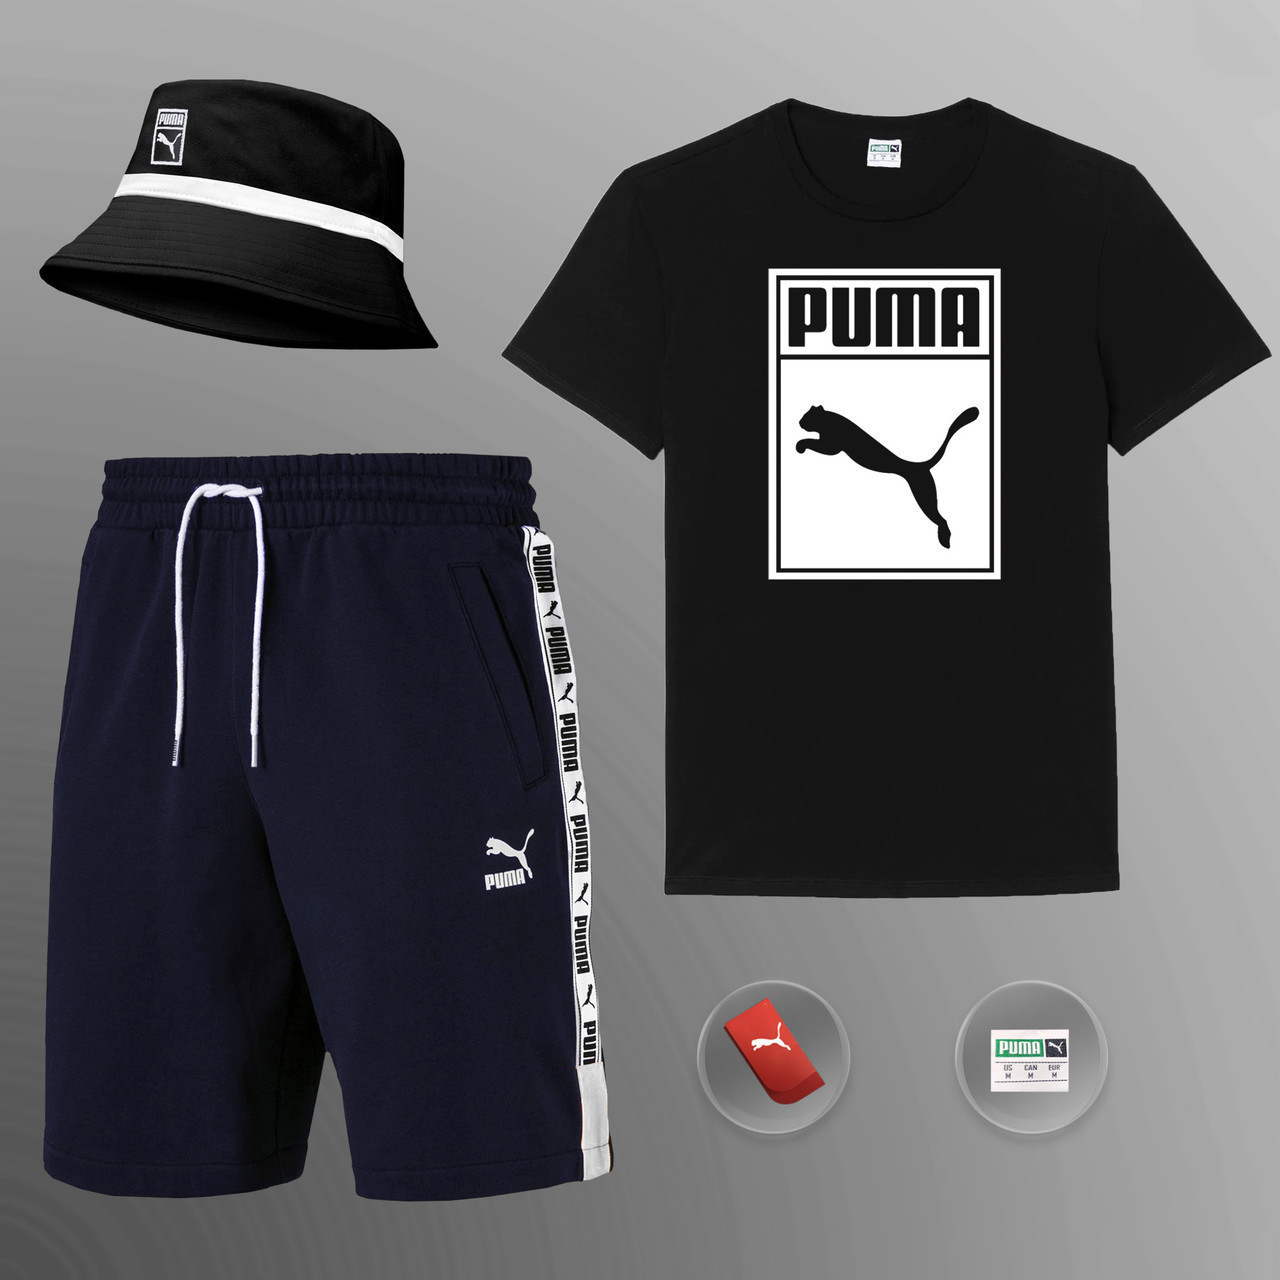 Мужской летний костюм Puma (ориг.бирка) комплект 3 в 1